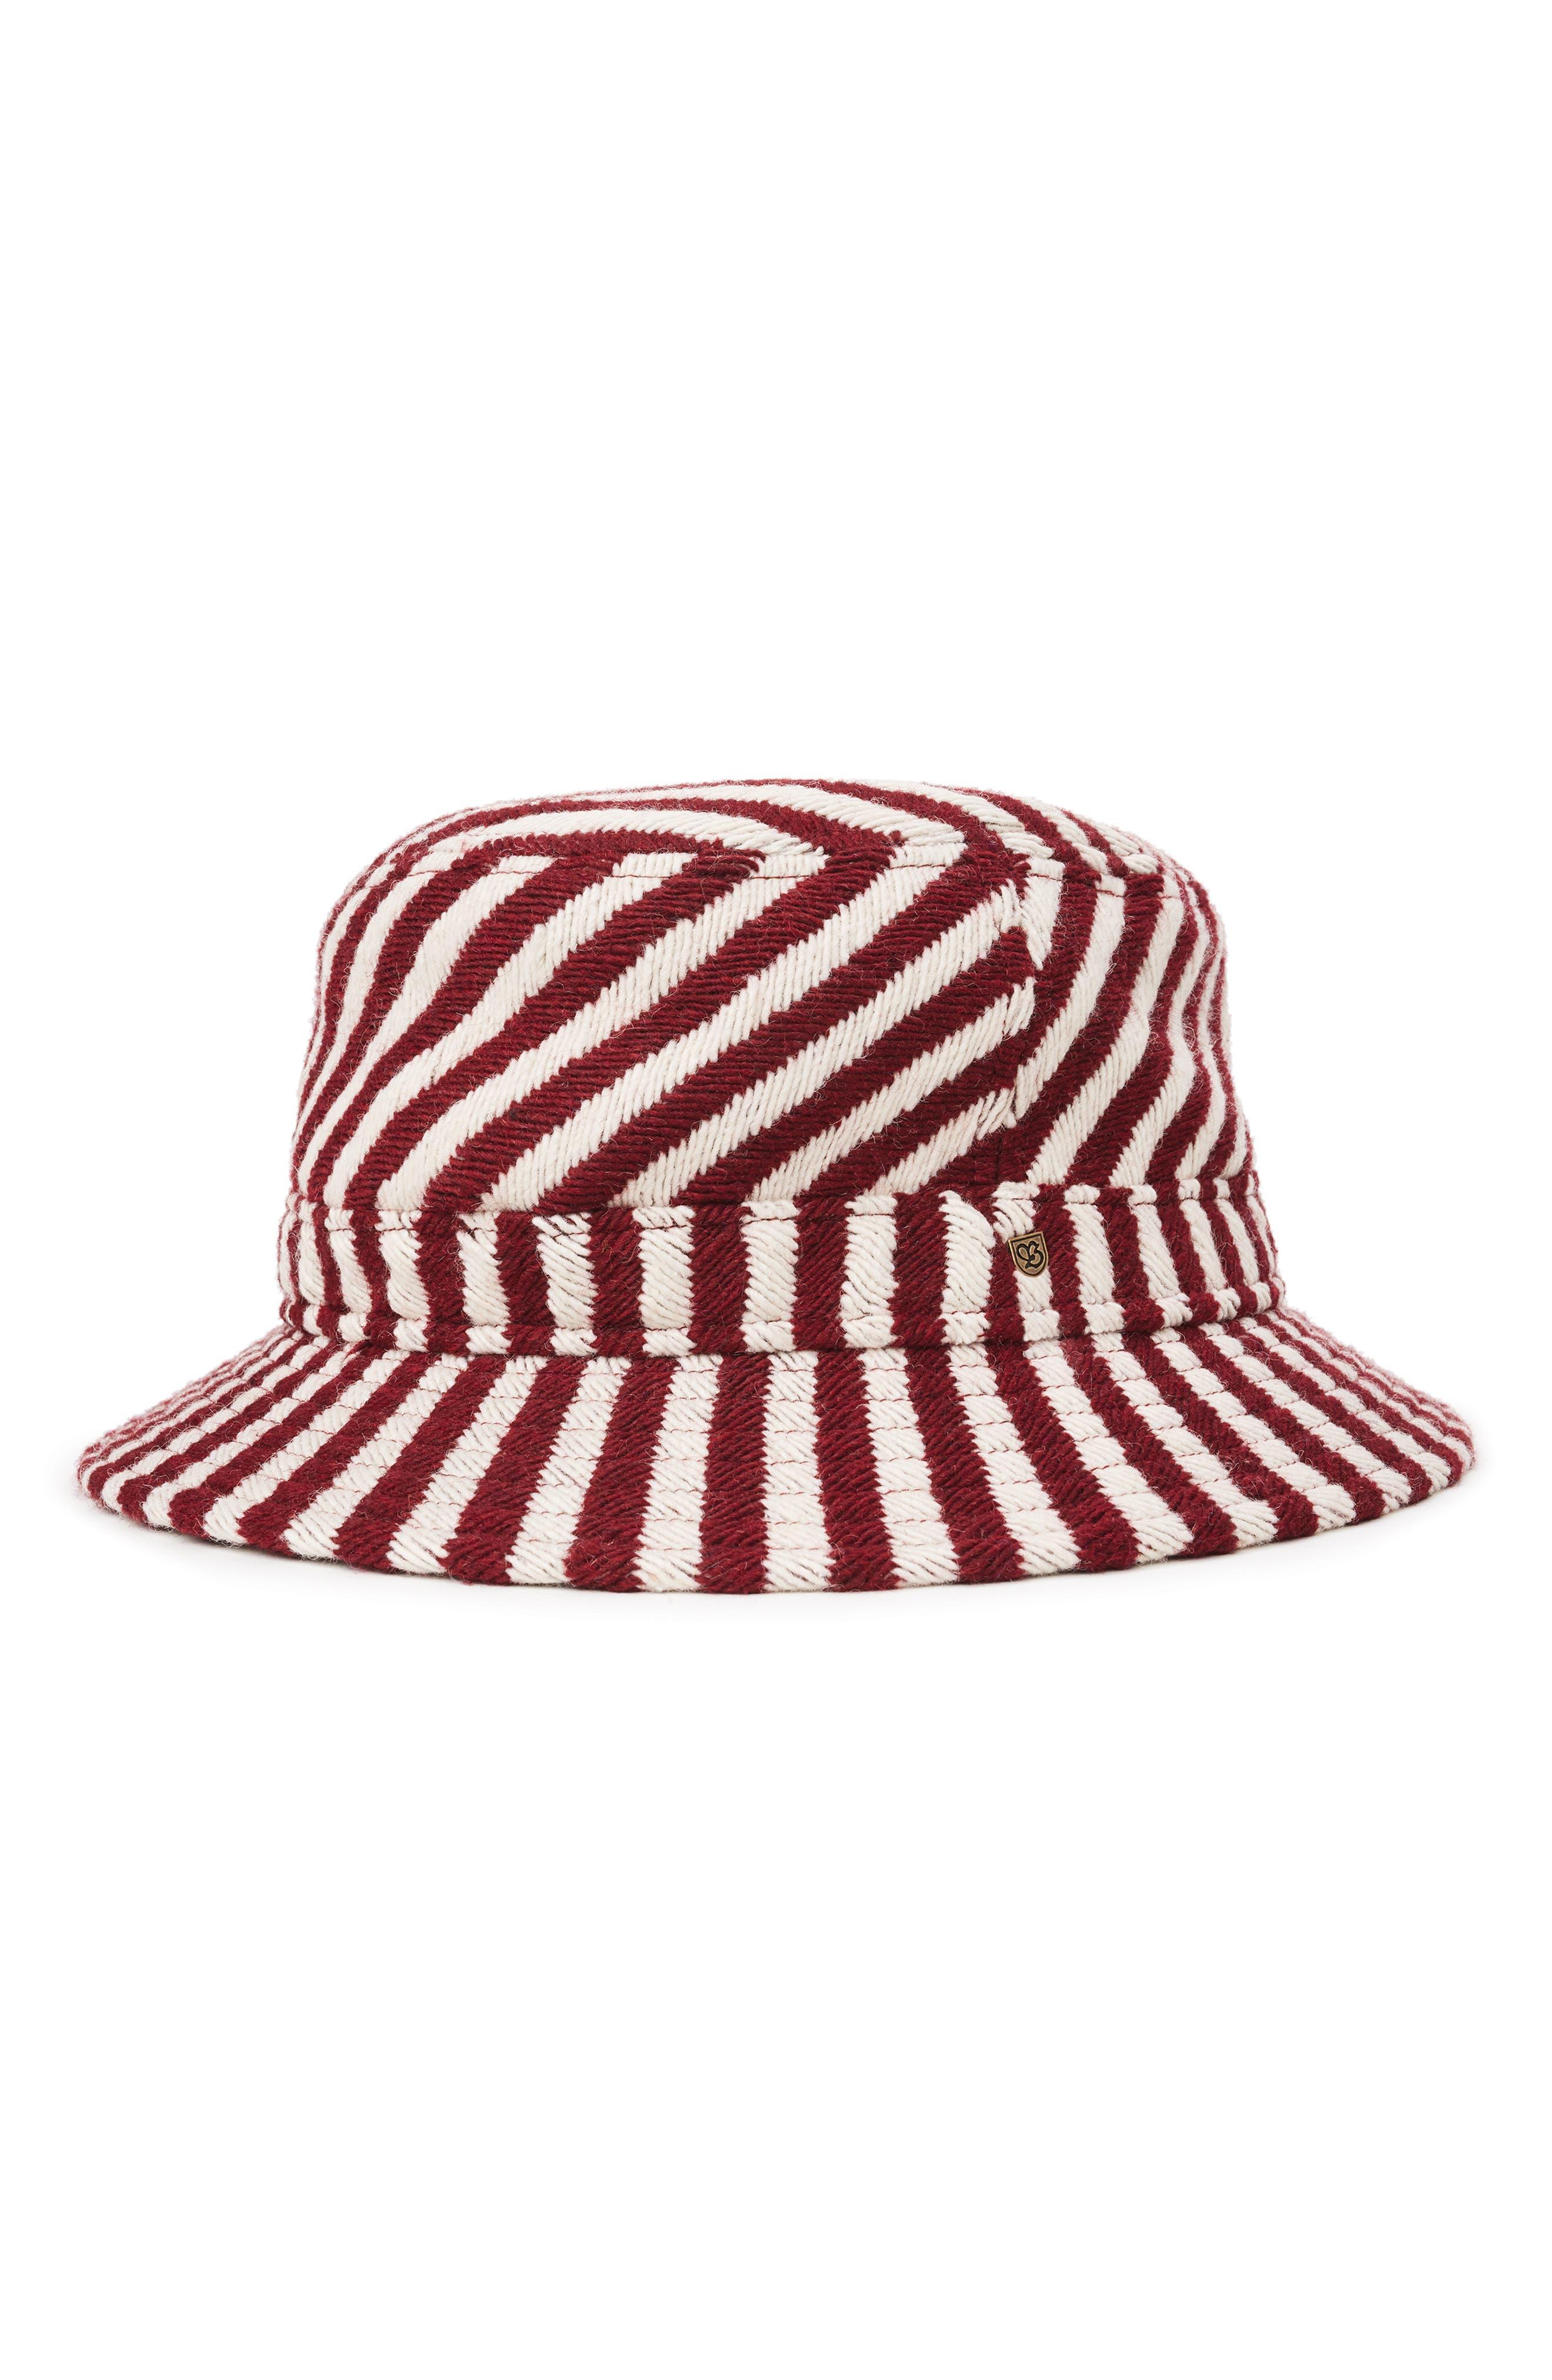 Hardy Bucket Hat - Red in Burgundy